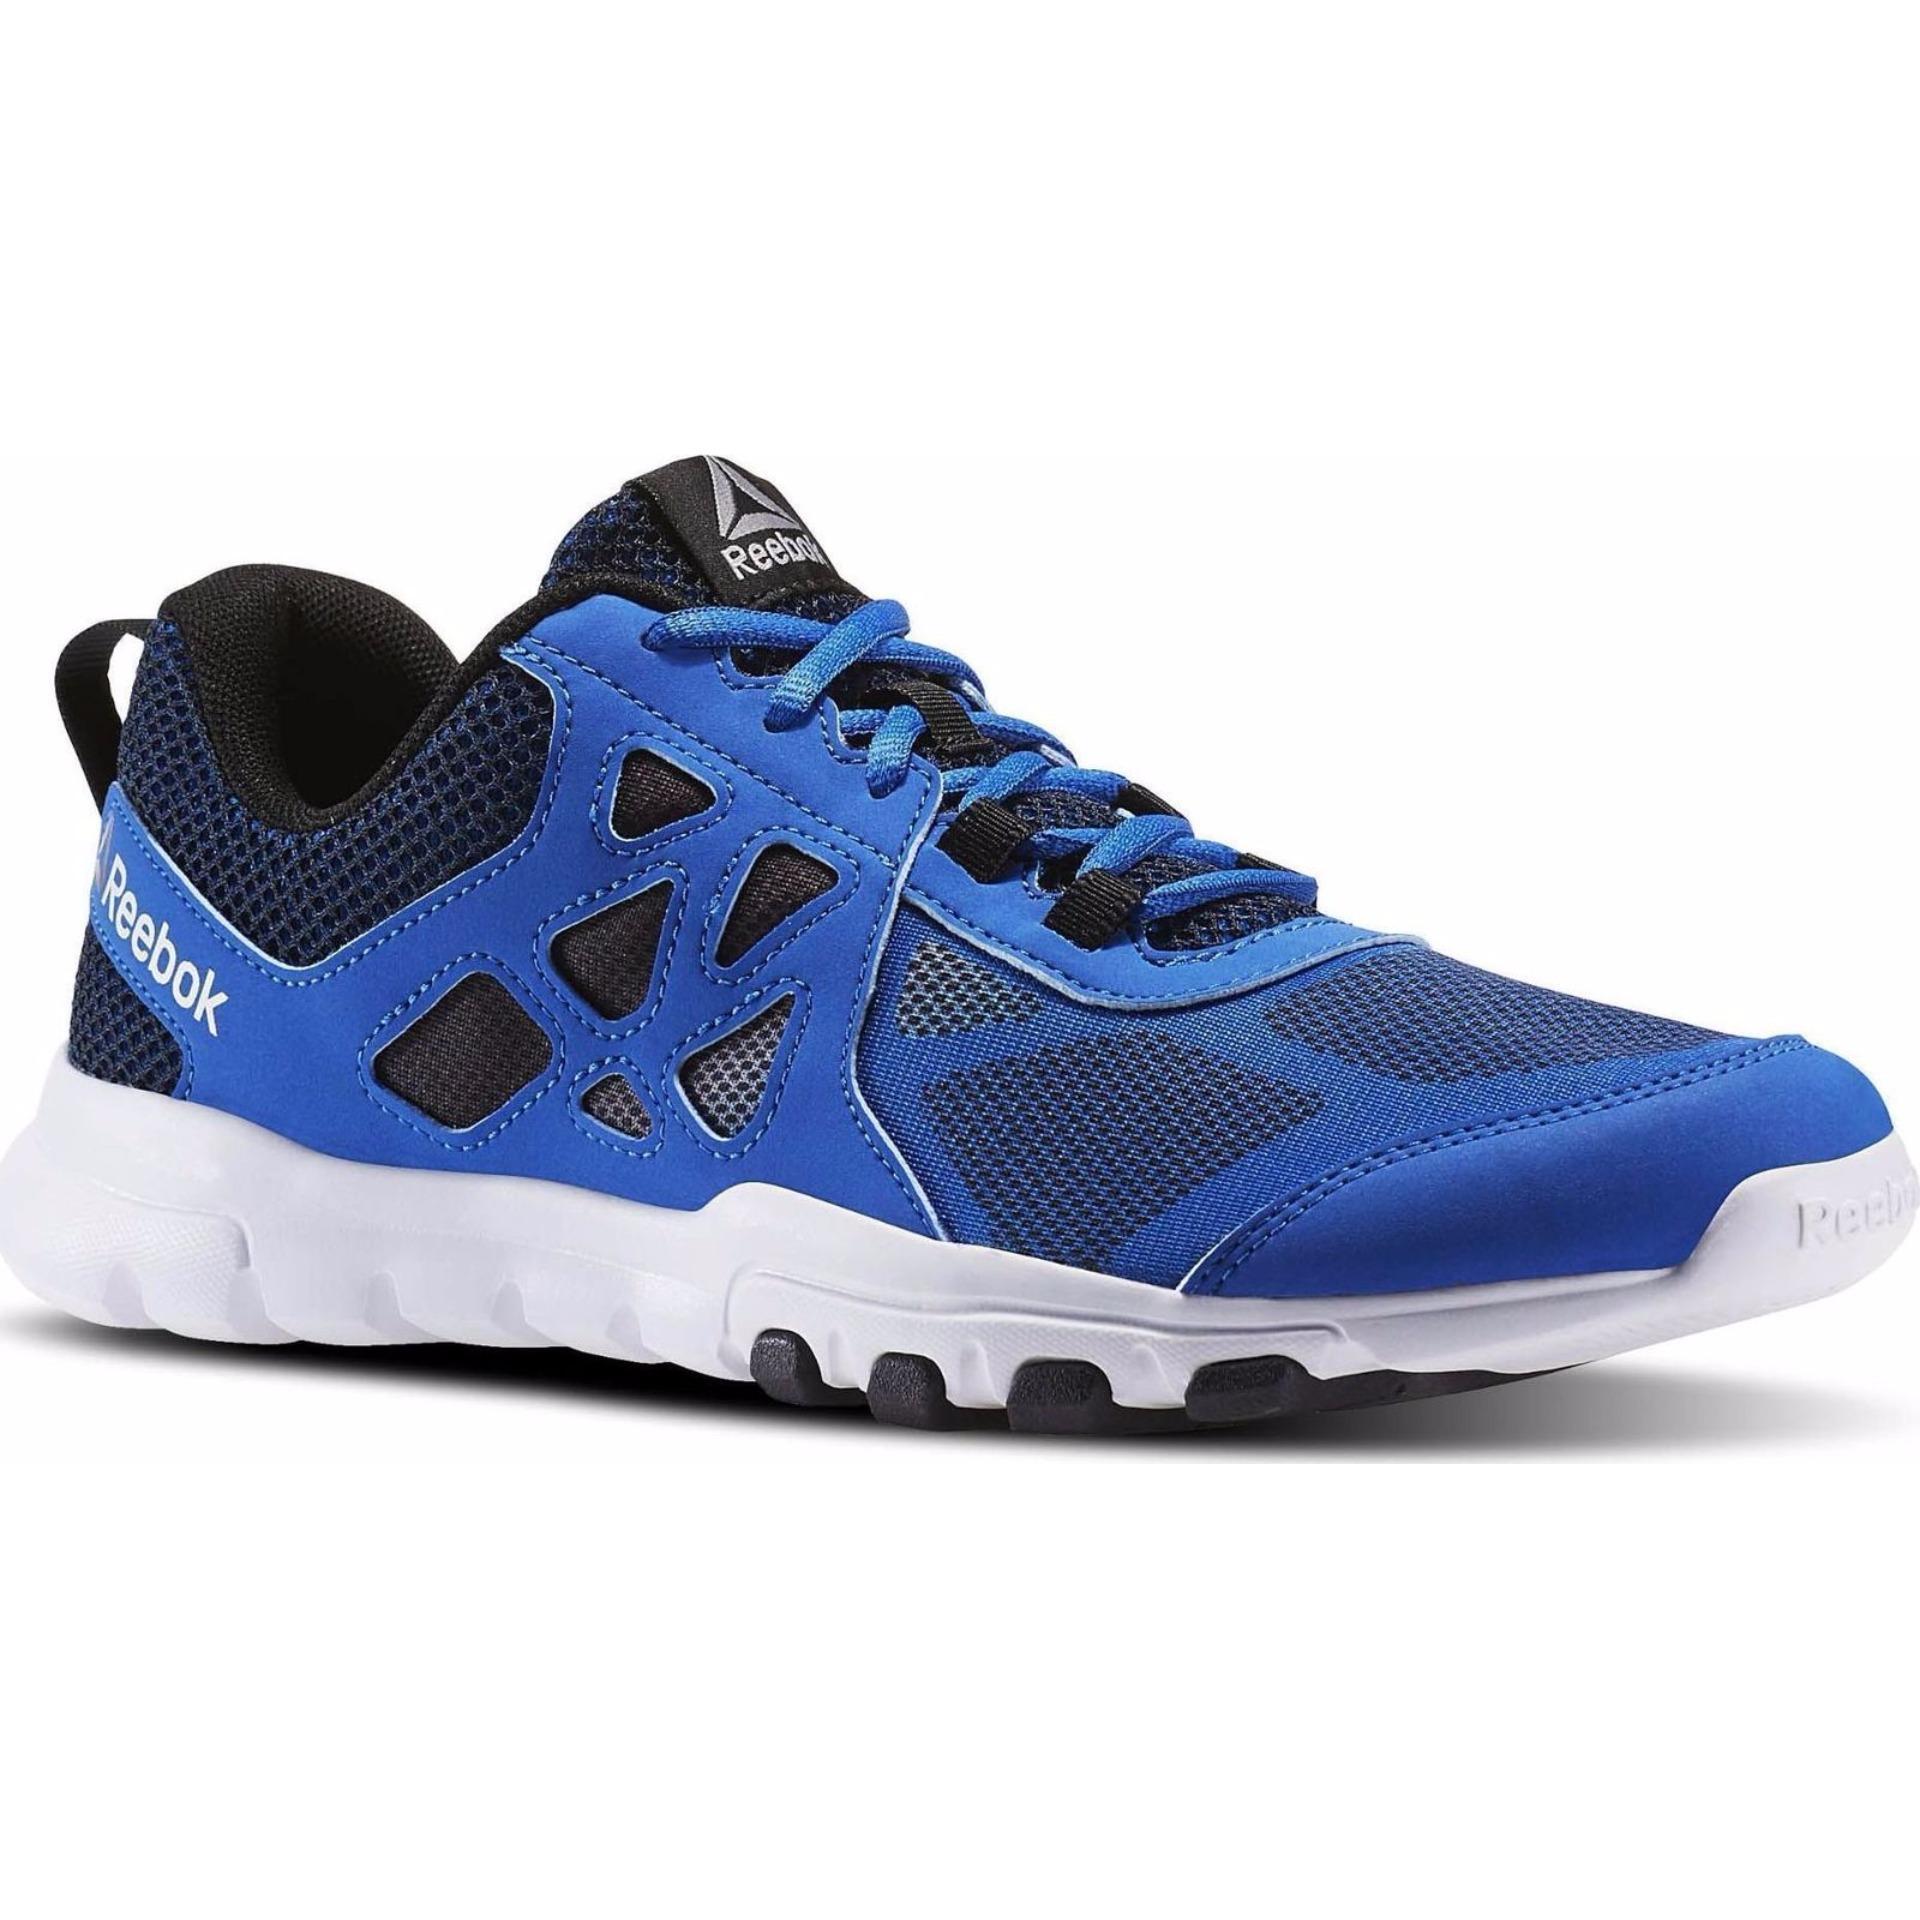 Promo Reebok Sublite Train 4 Men S Running Shoes Bd5923 Murah